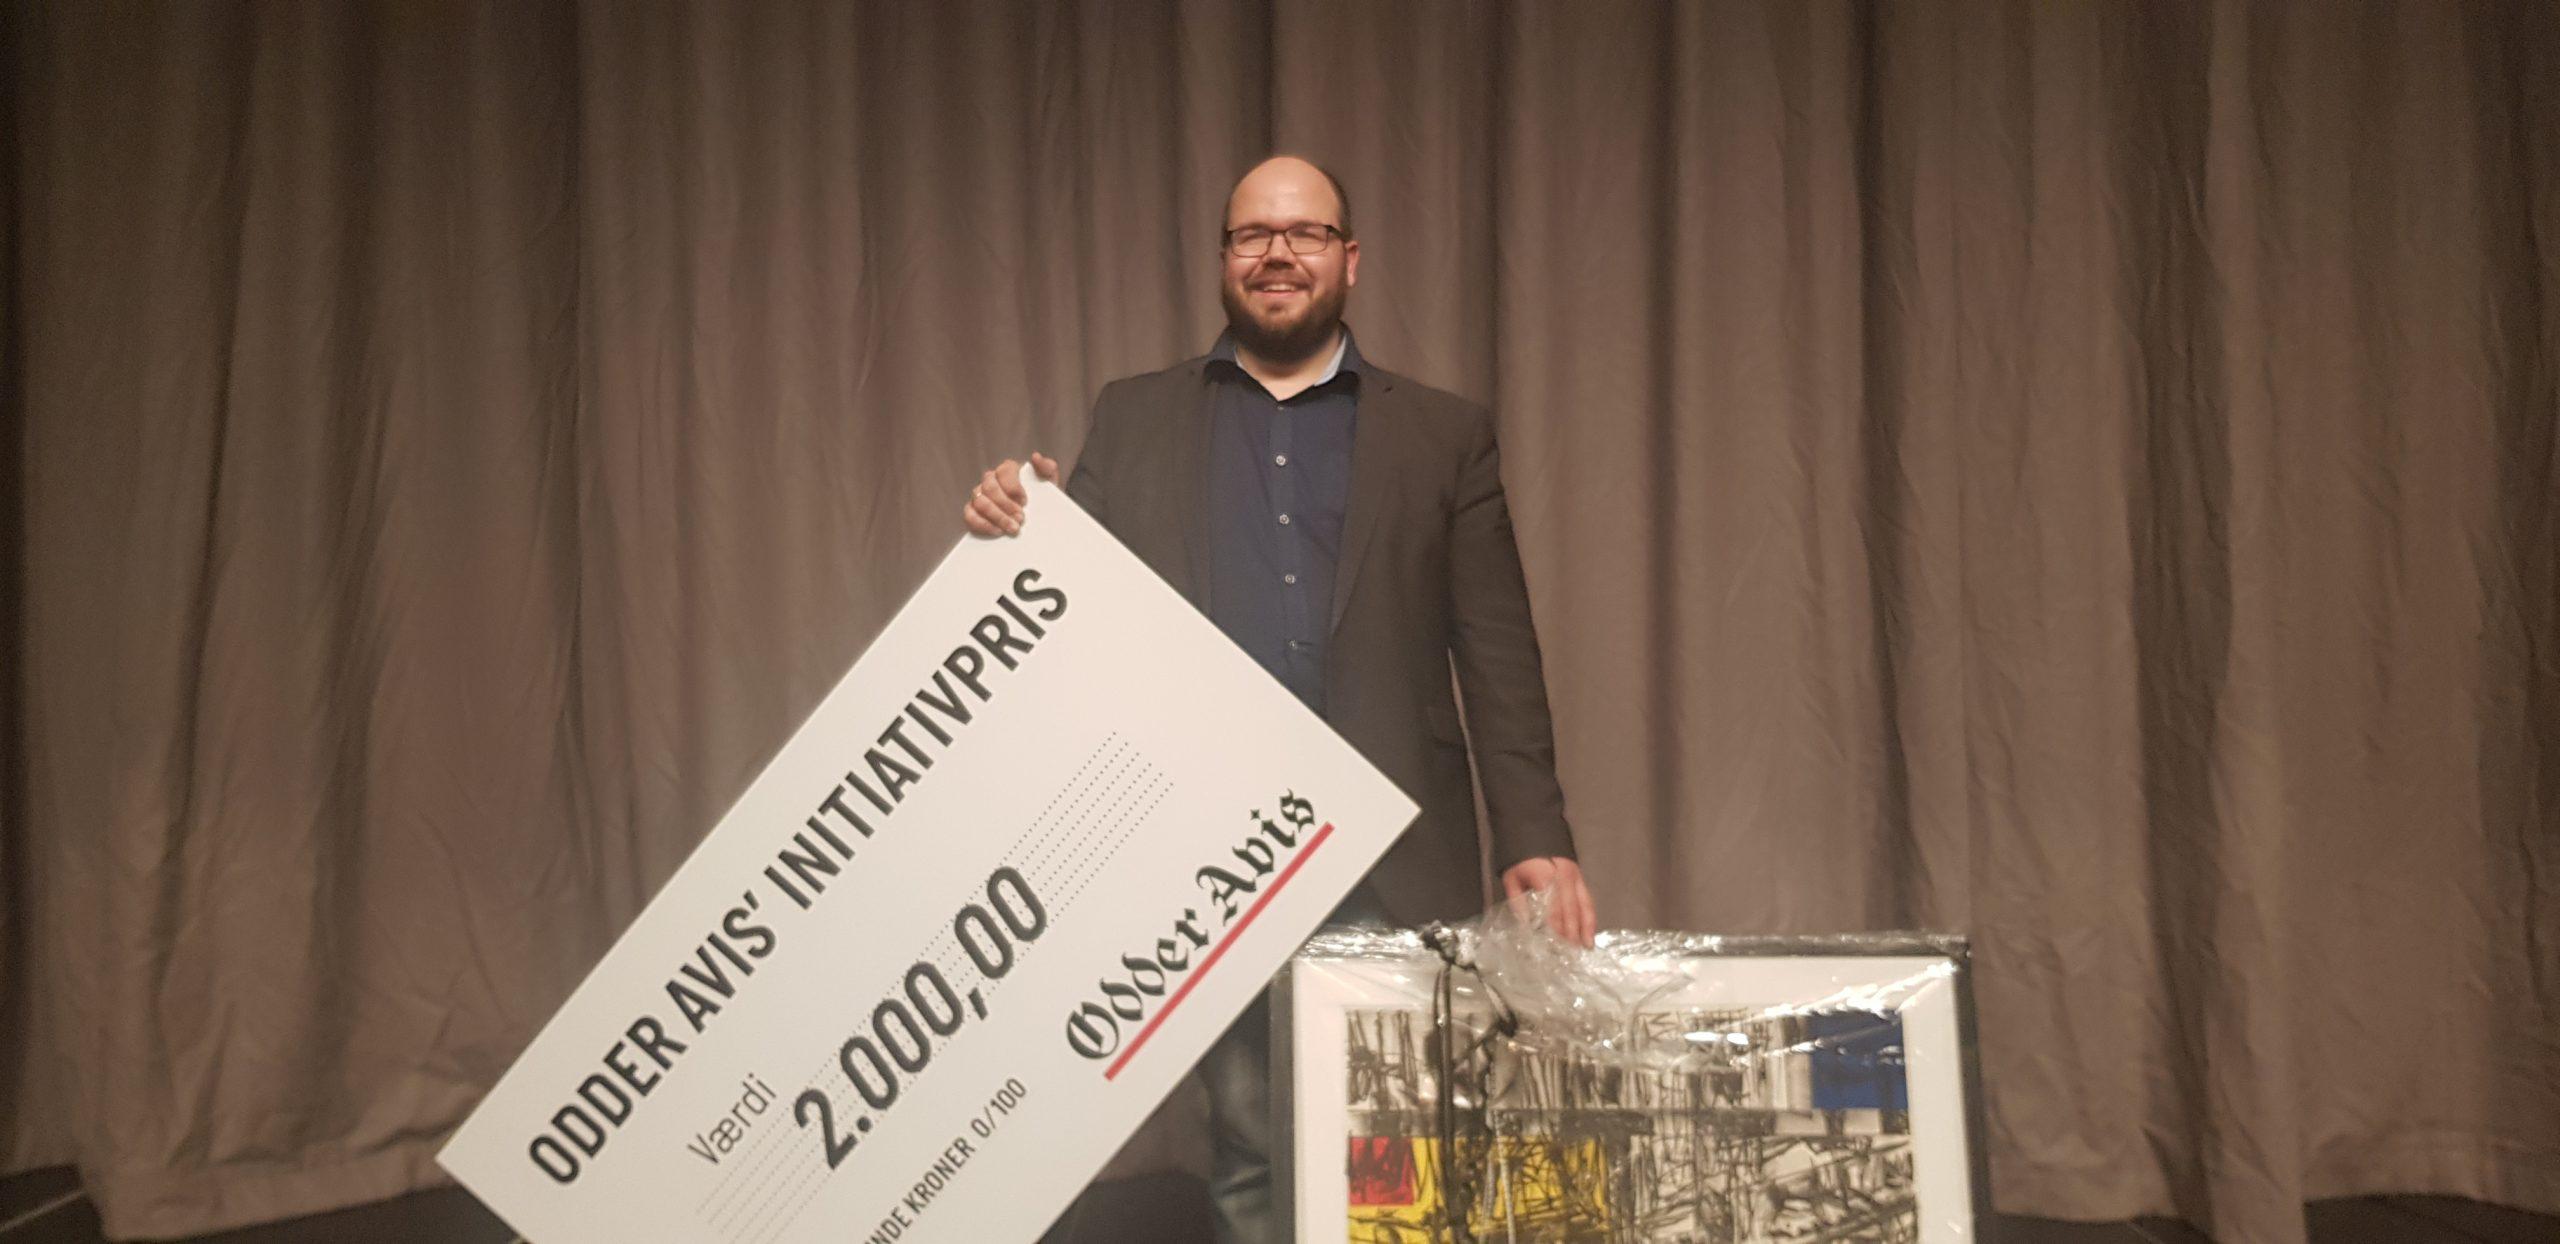 Lars Dalsgaard Larsen modtog Odder Avis' Initiativpris